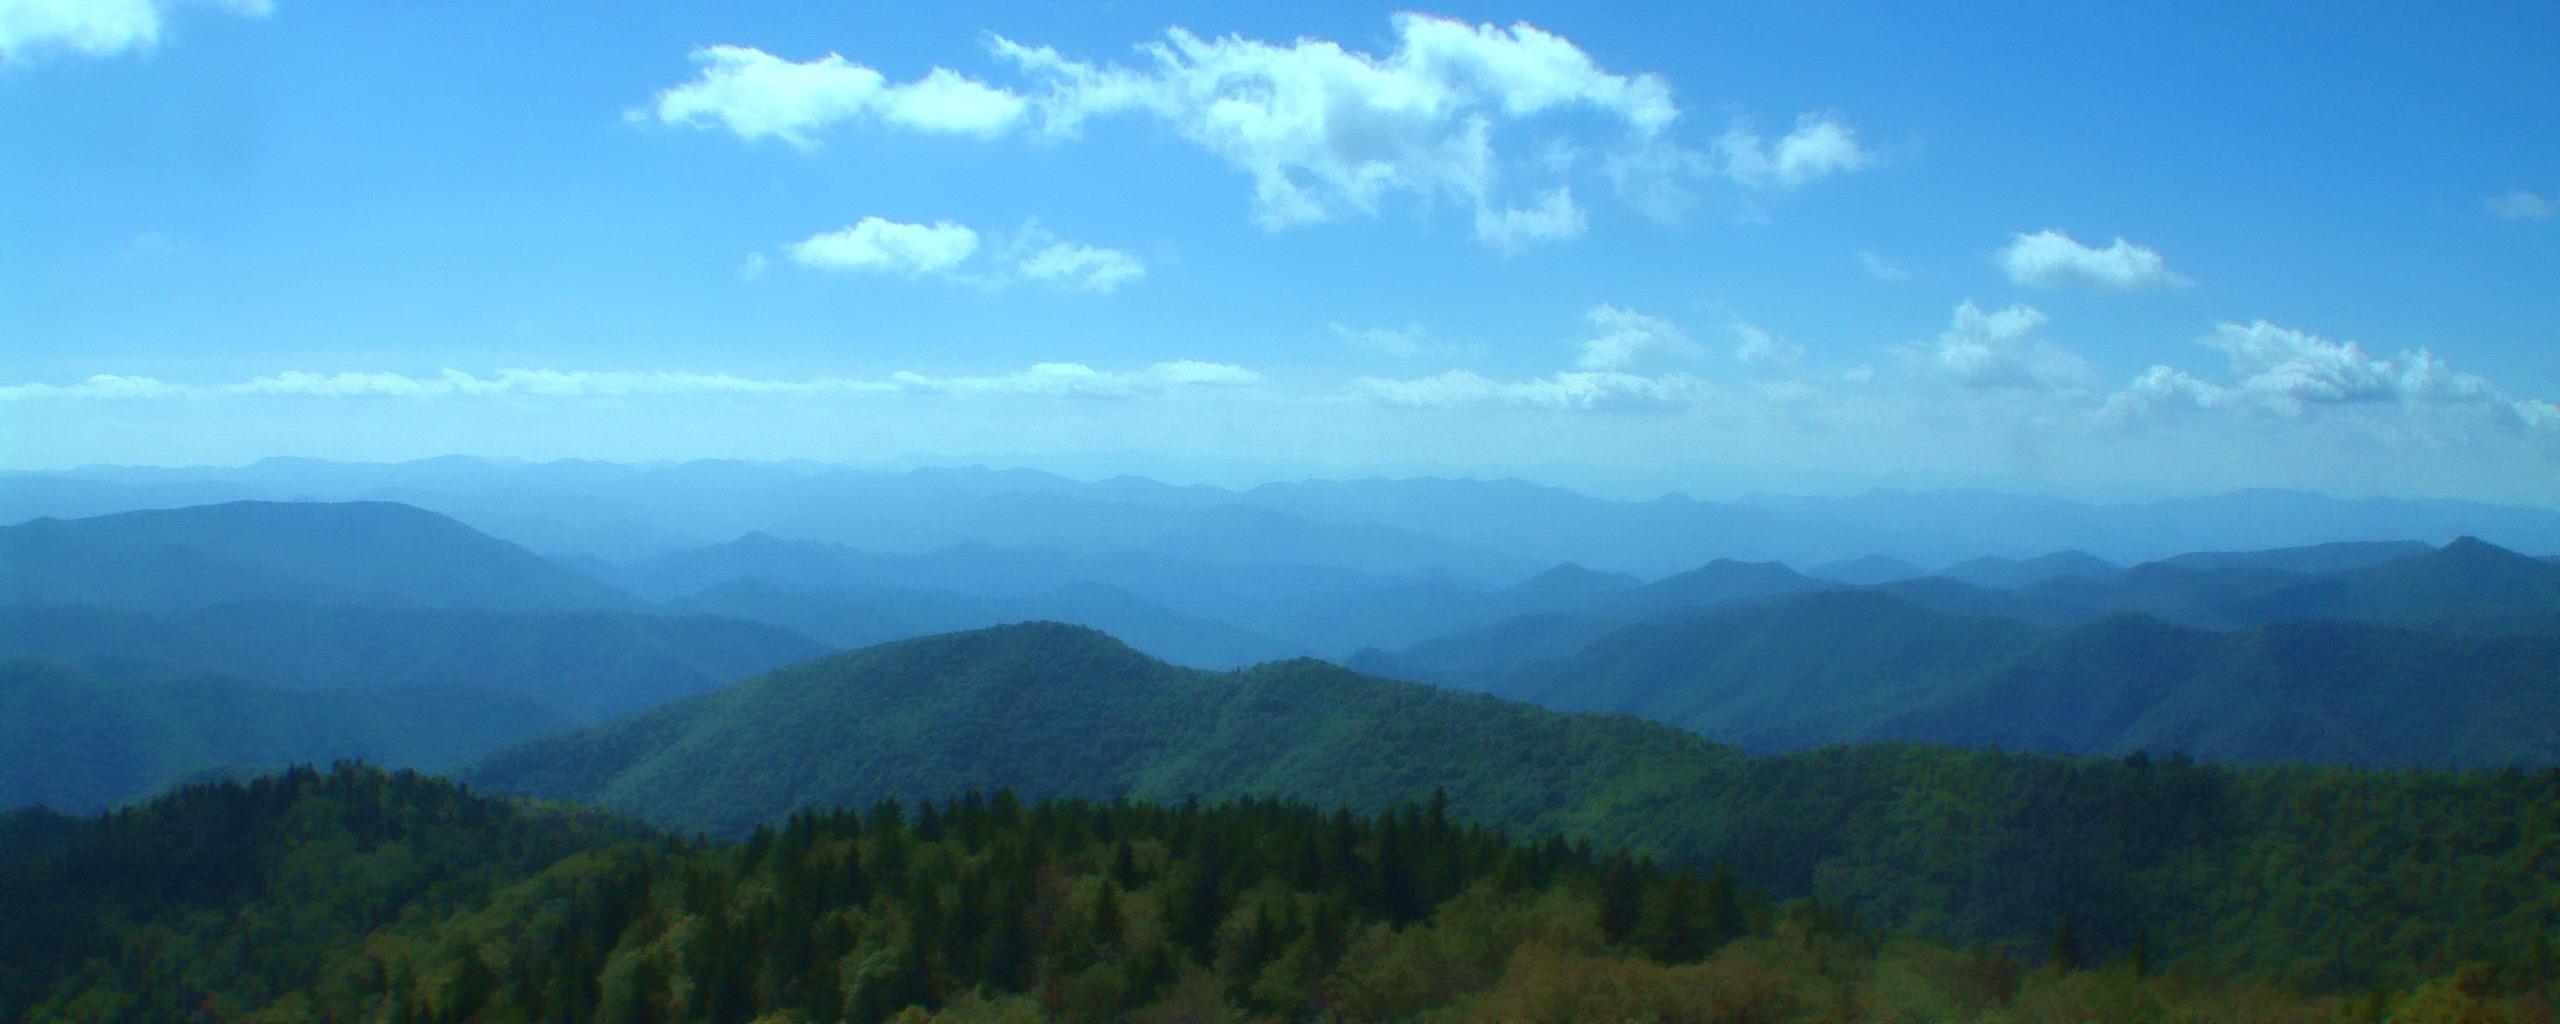 appalachian blue ridge mountains wallpaper - photo #24